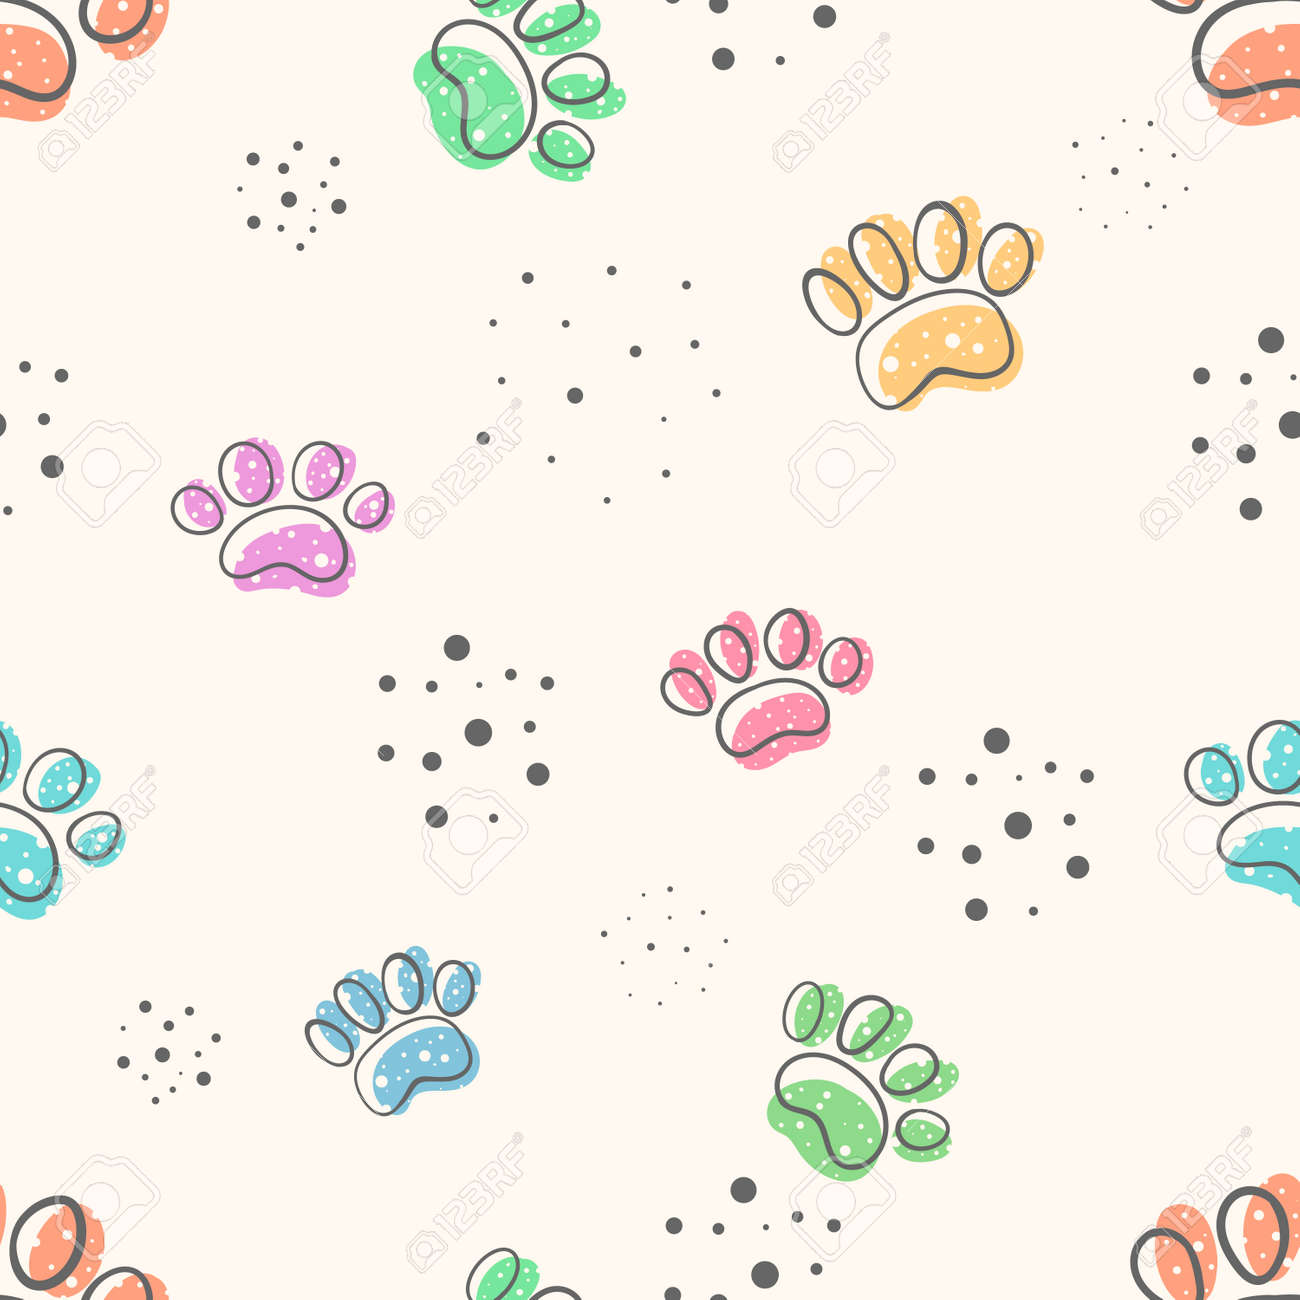 Dog Paw Cute Seamles Pattern Hand Draw